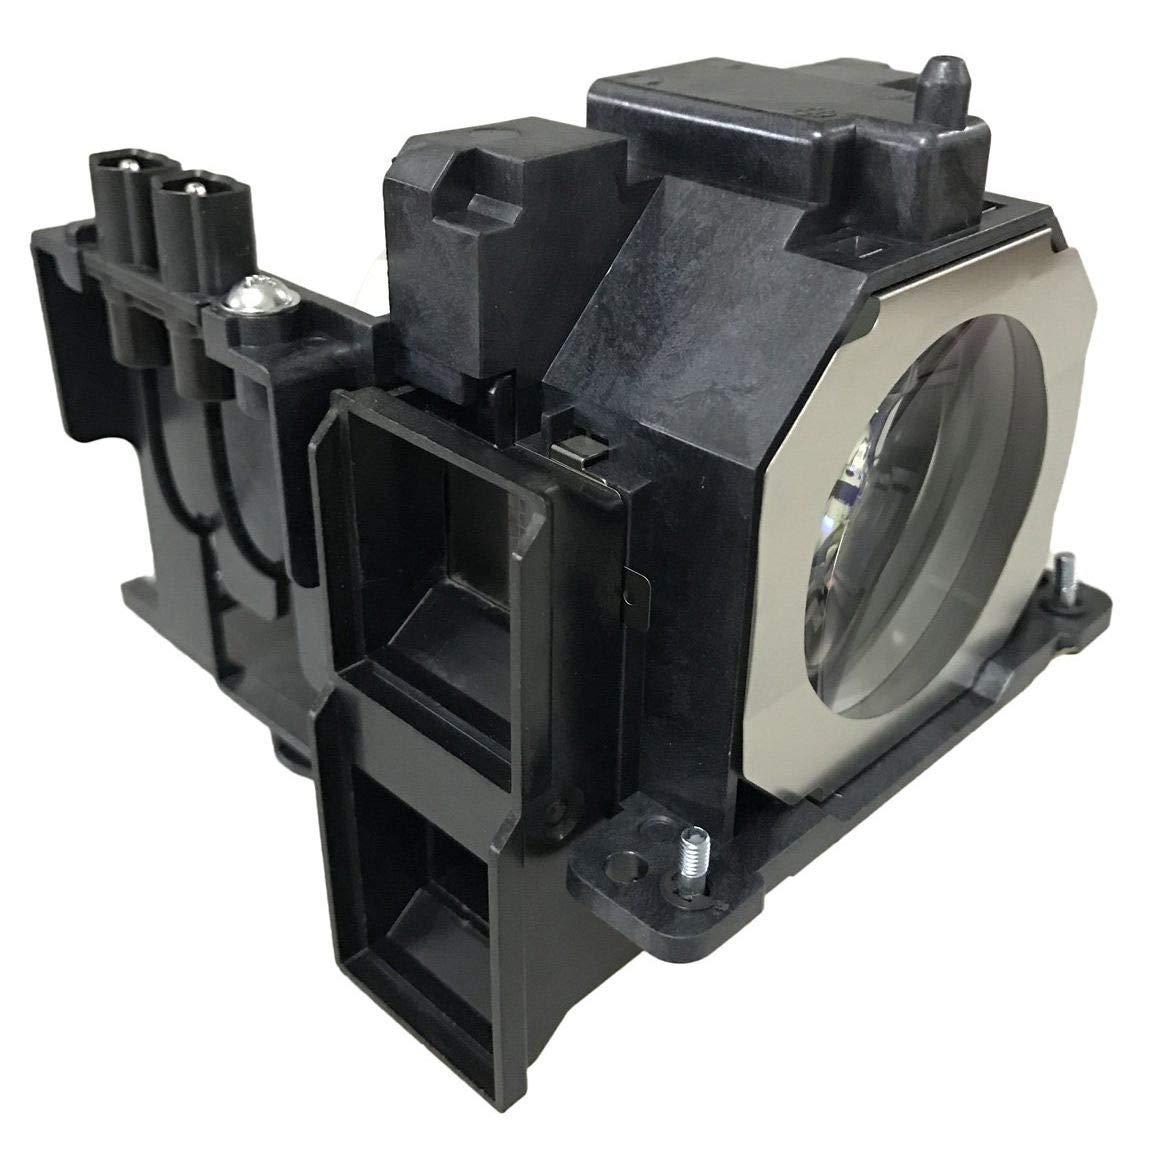 PT-61DLX75 GOLDENRIVER TY-LA2005 A+Quality Projector Replacement Lamp with Housing Compatible with PANASONIC PT-56DLX25 PT-56DLX75 PT-61DLX25